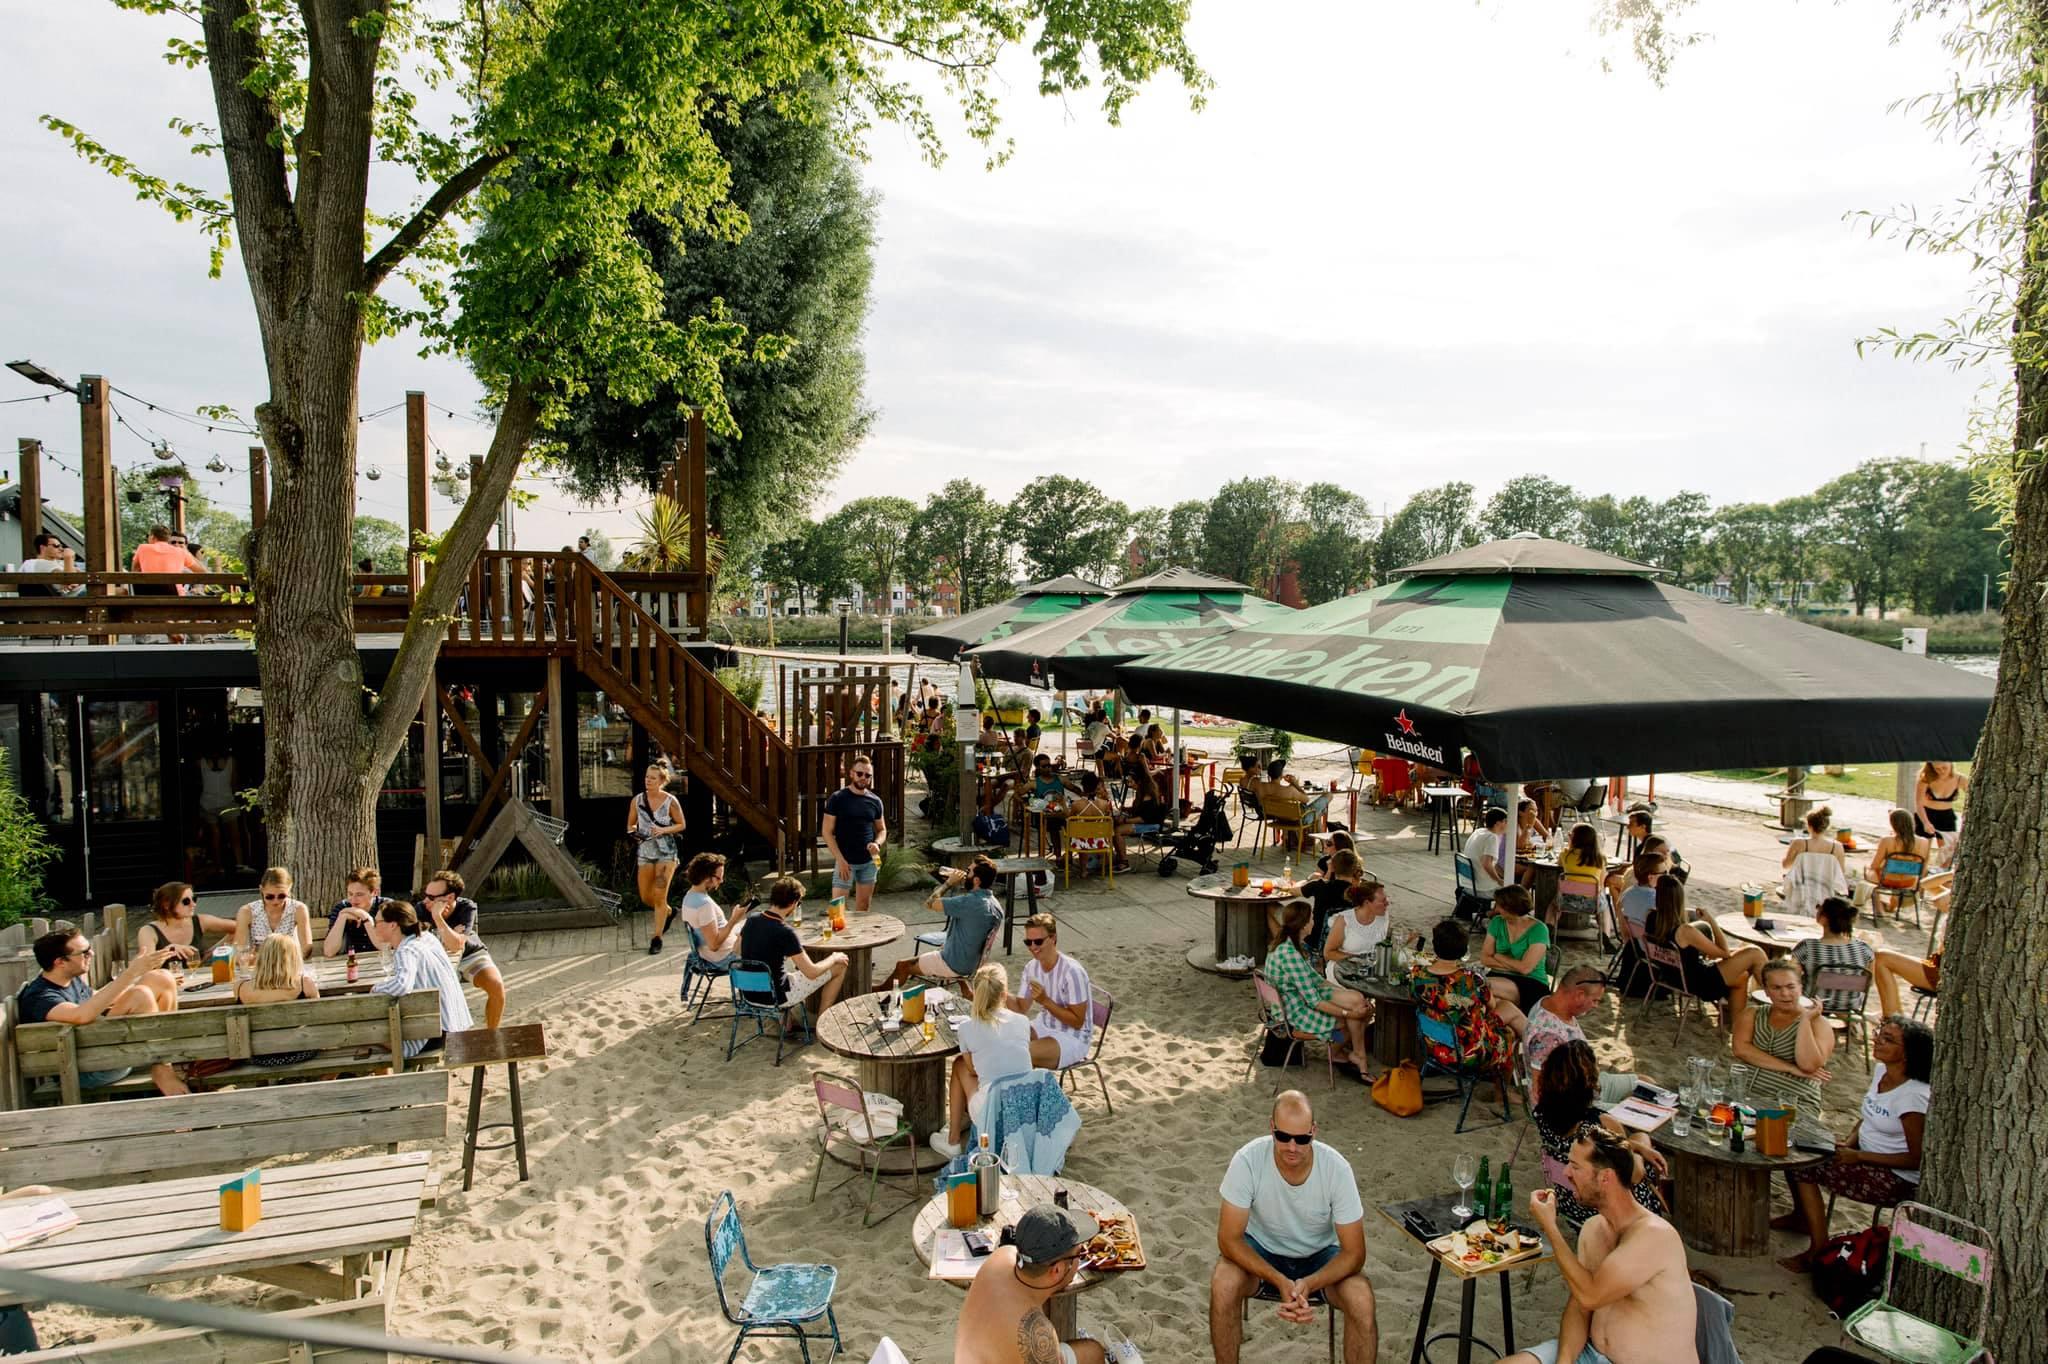 De leukste stadsstranden in Nederland, SOIA Utrecht